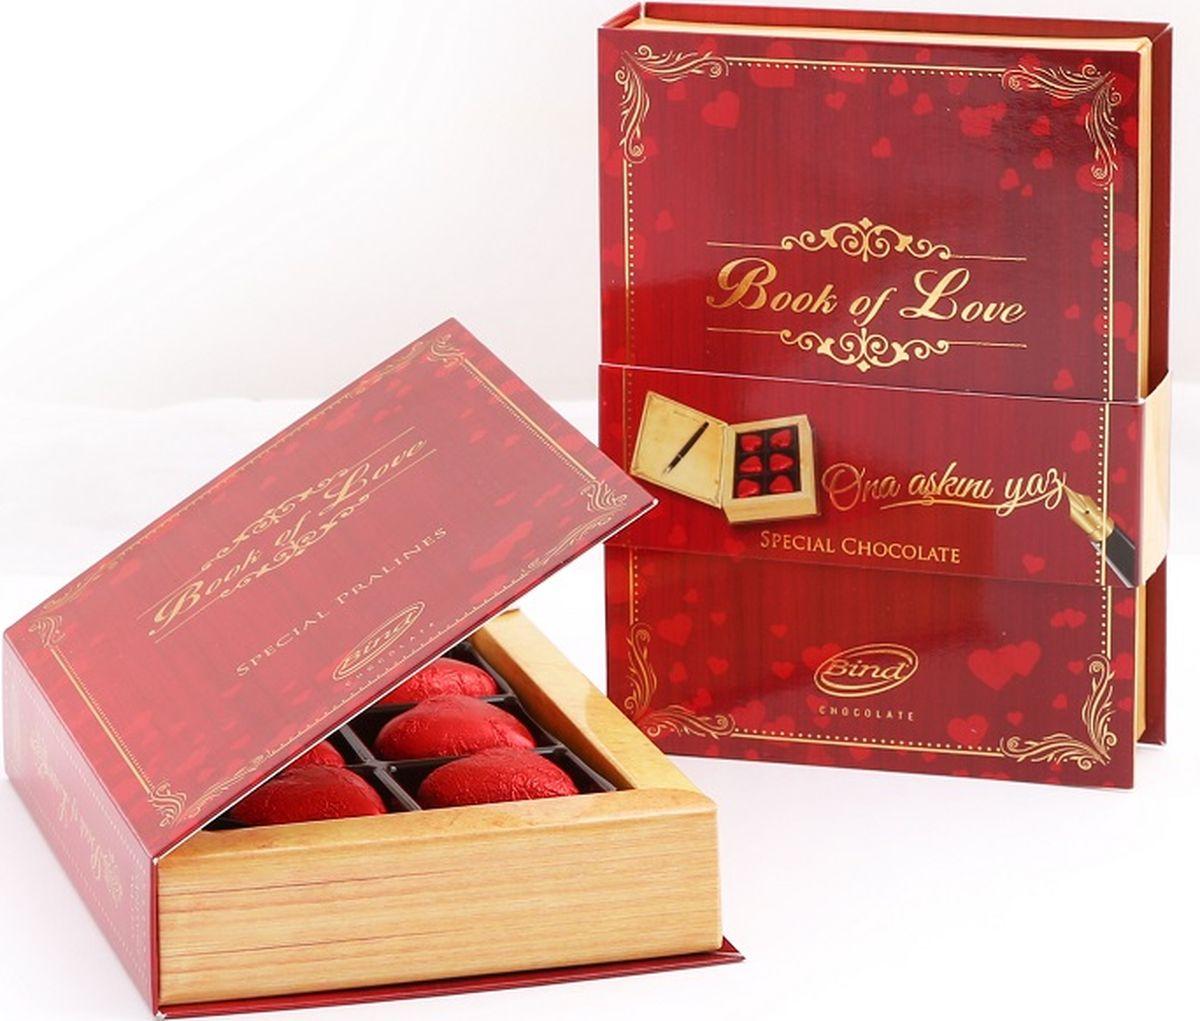 Bind Книга любви набор шоколадных конфет, 90 г bind сердце набор шоколадных конфет 225 г